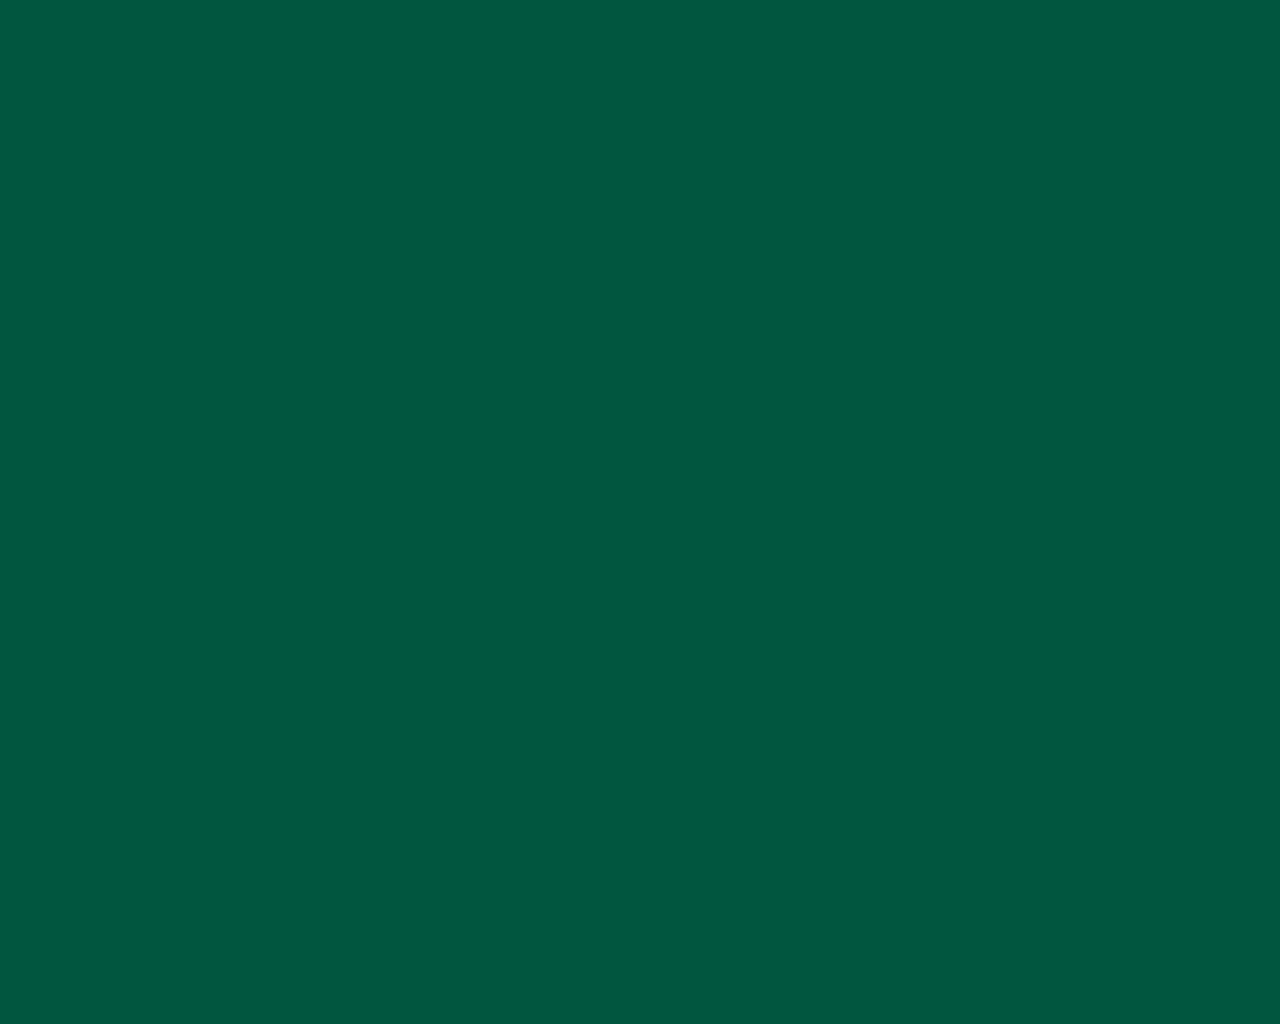 1280x1024 Castleton Green Solid Color Background